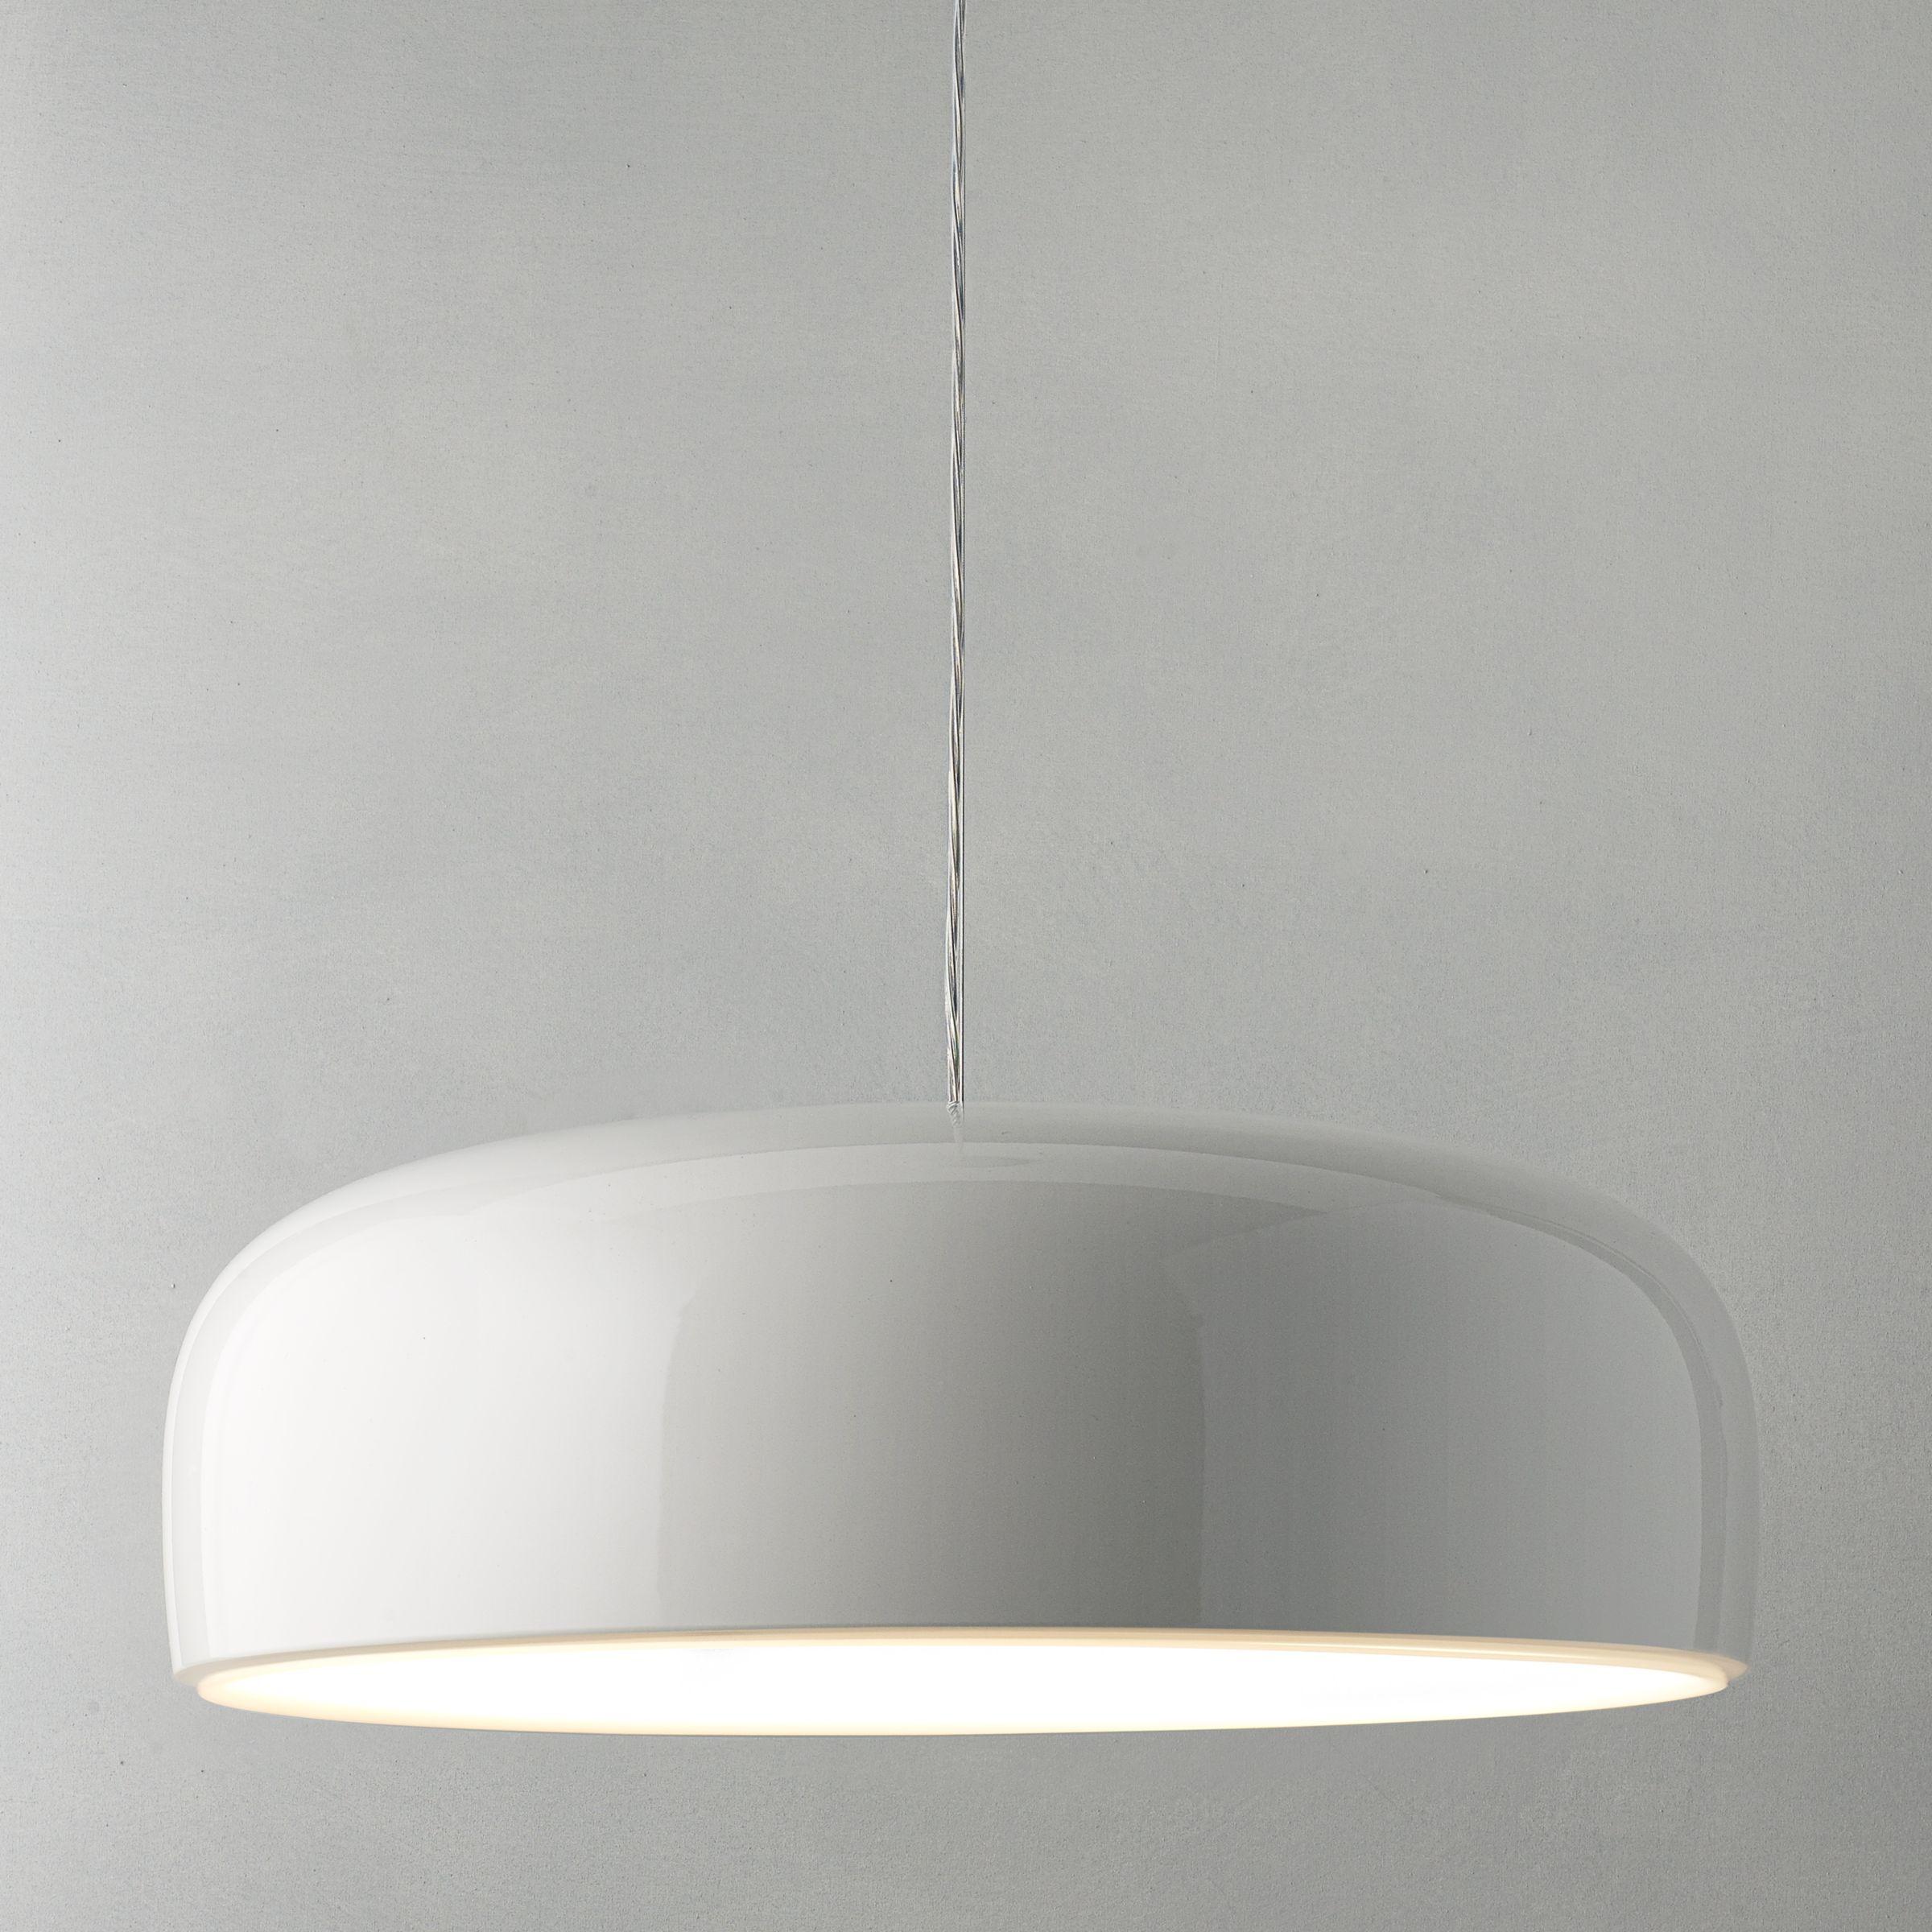 Flos Flos Smithfield Ceiling Light